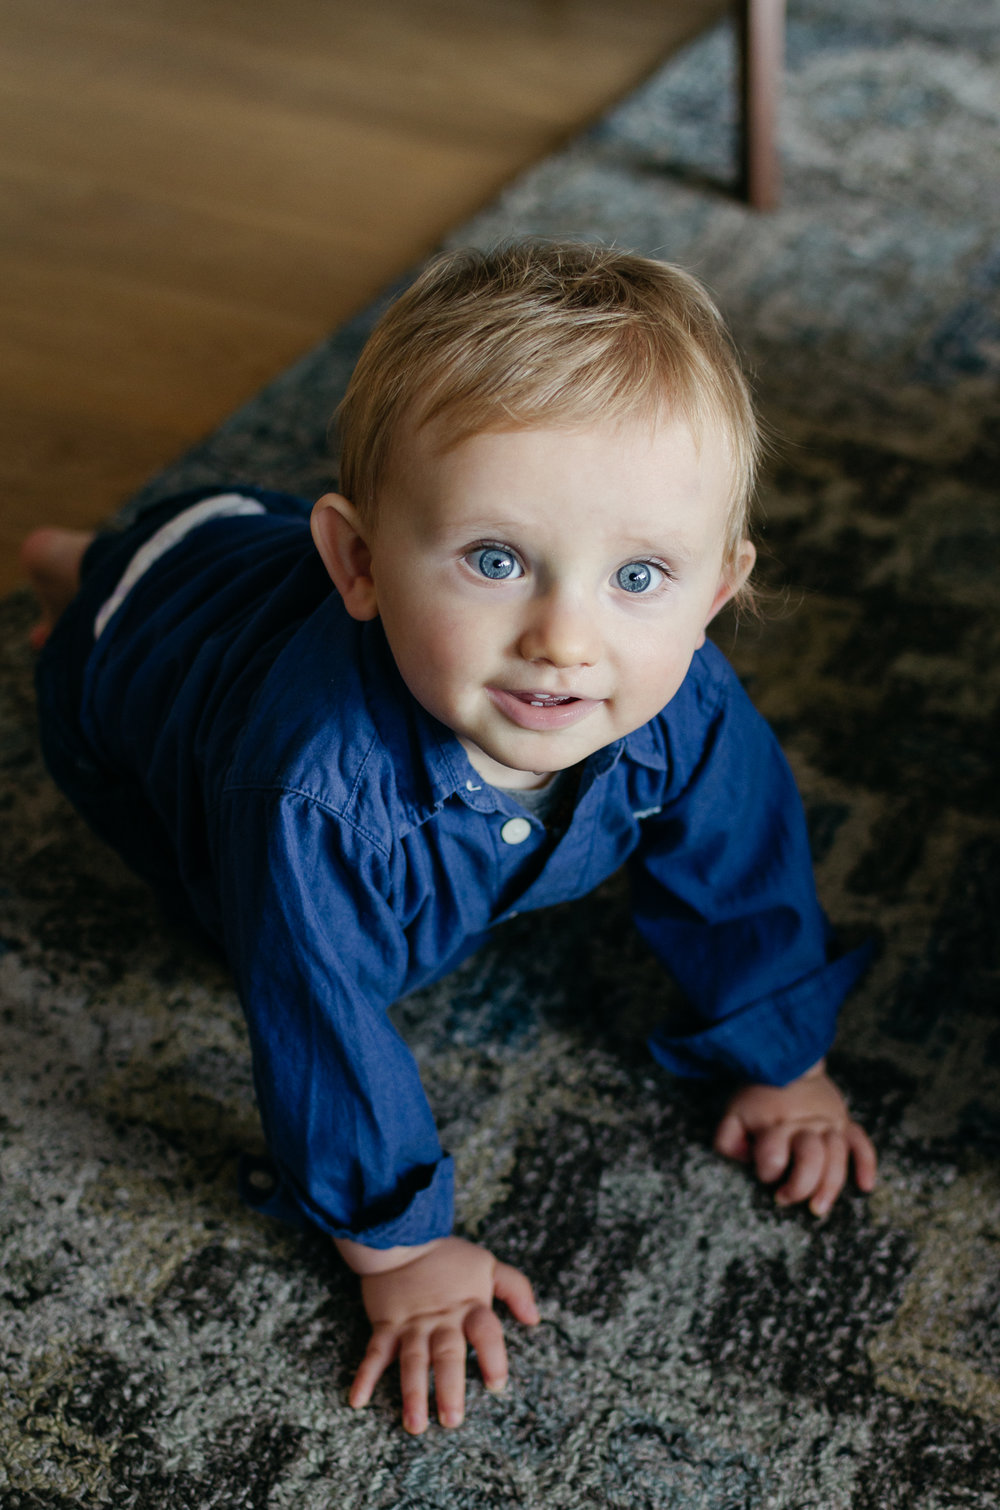 Vicky_McLachlan_Photography_Family_Newborn_Lifestyle_Photographer-1-8.jpg